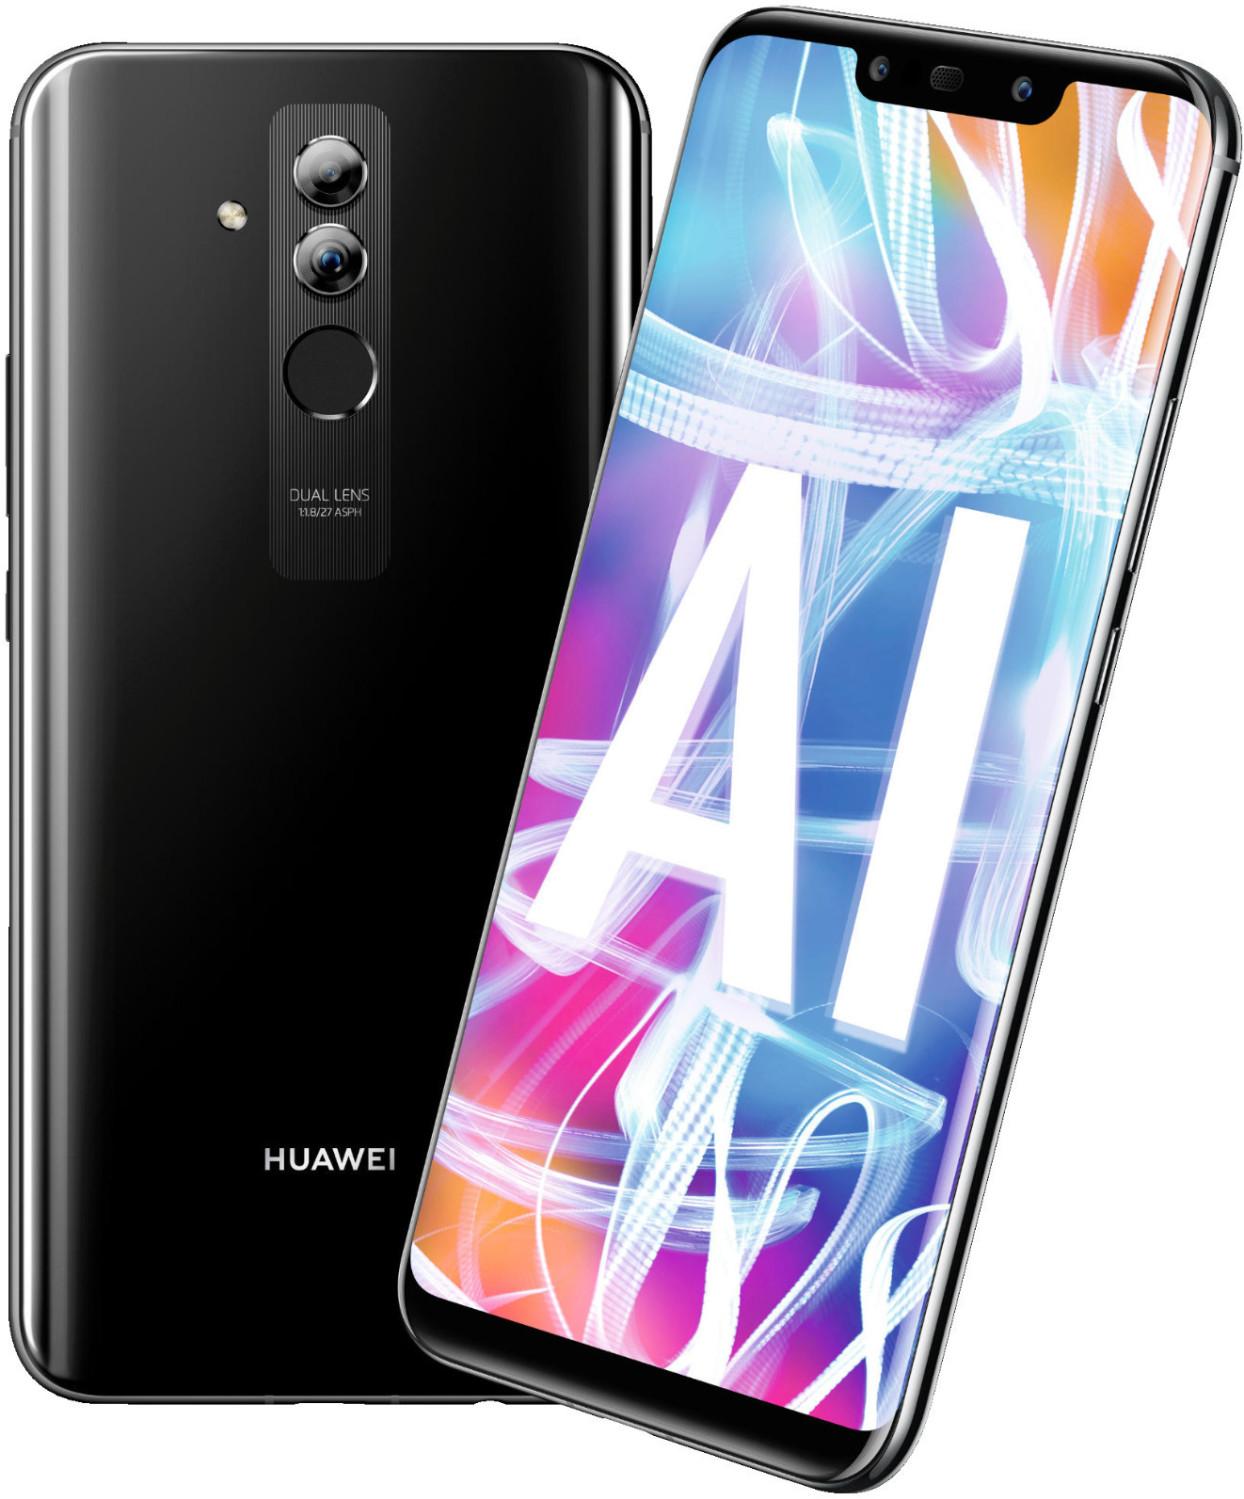 Huawei Mate 20 Lite Ab 23999 Preisvergleich Bei Idealode